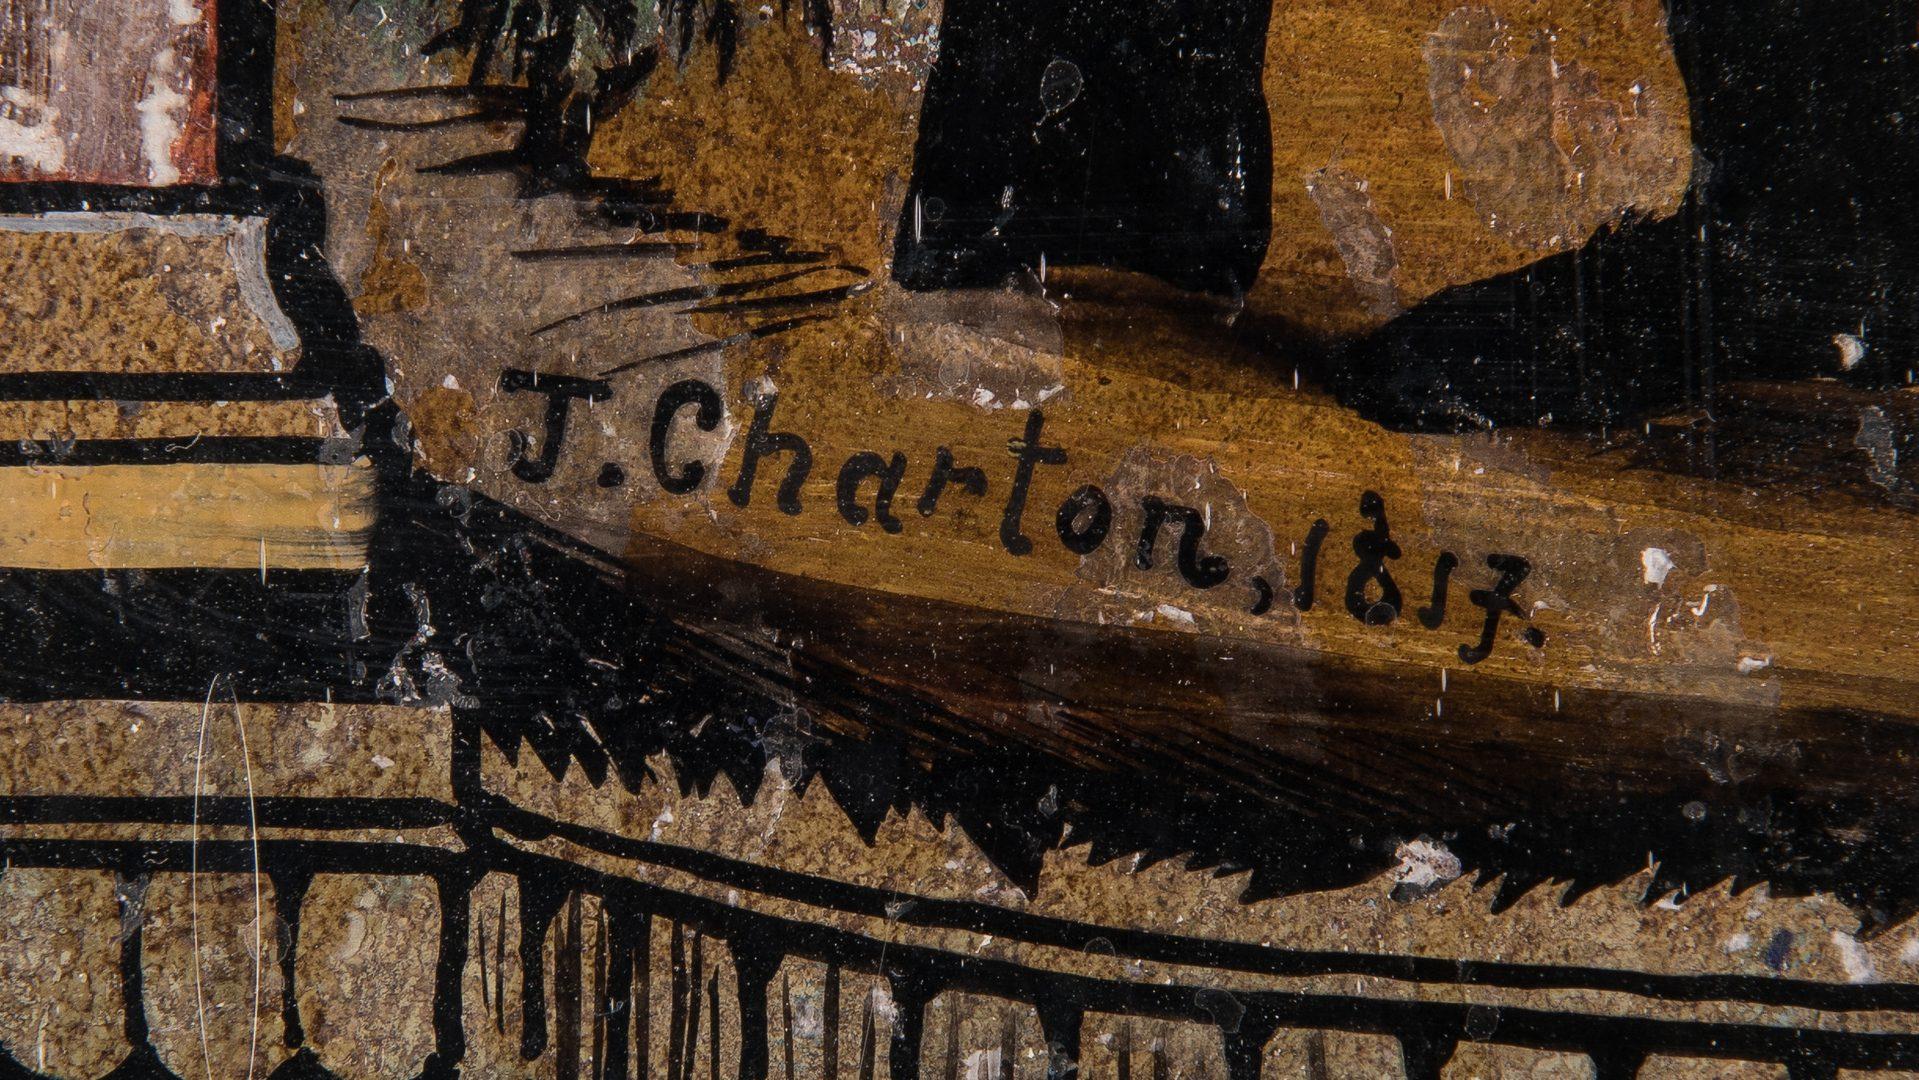 Lot 607: J. Chanton Daniel Boone Reverse Painting on Glass